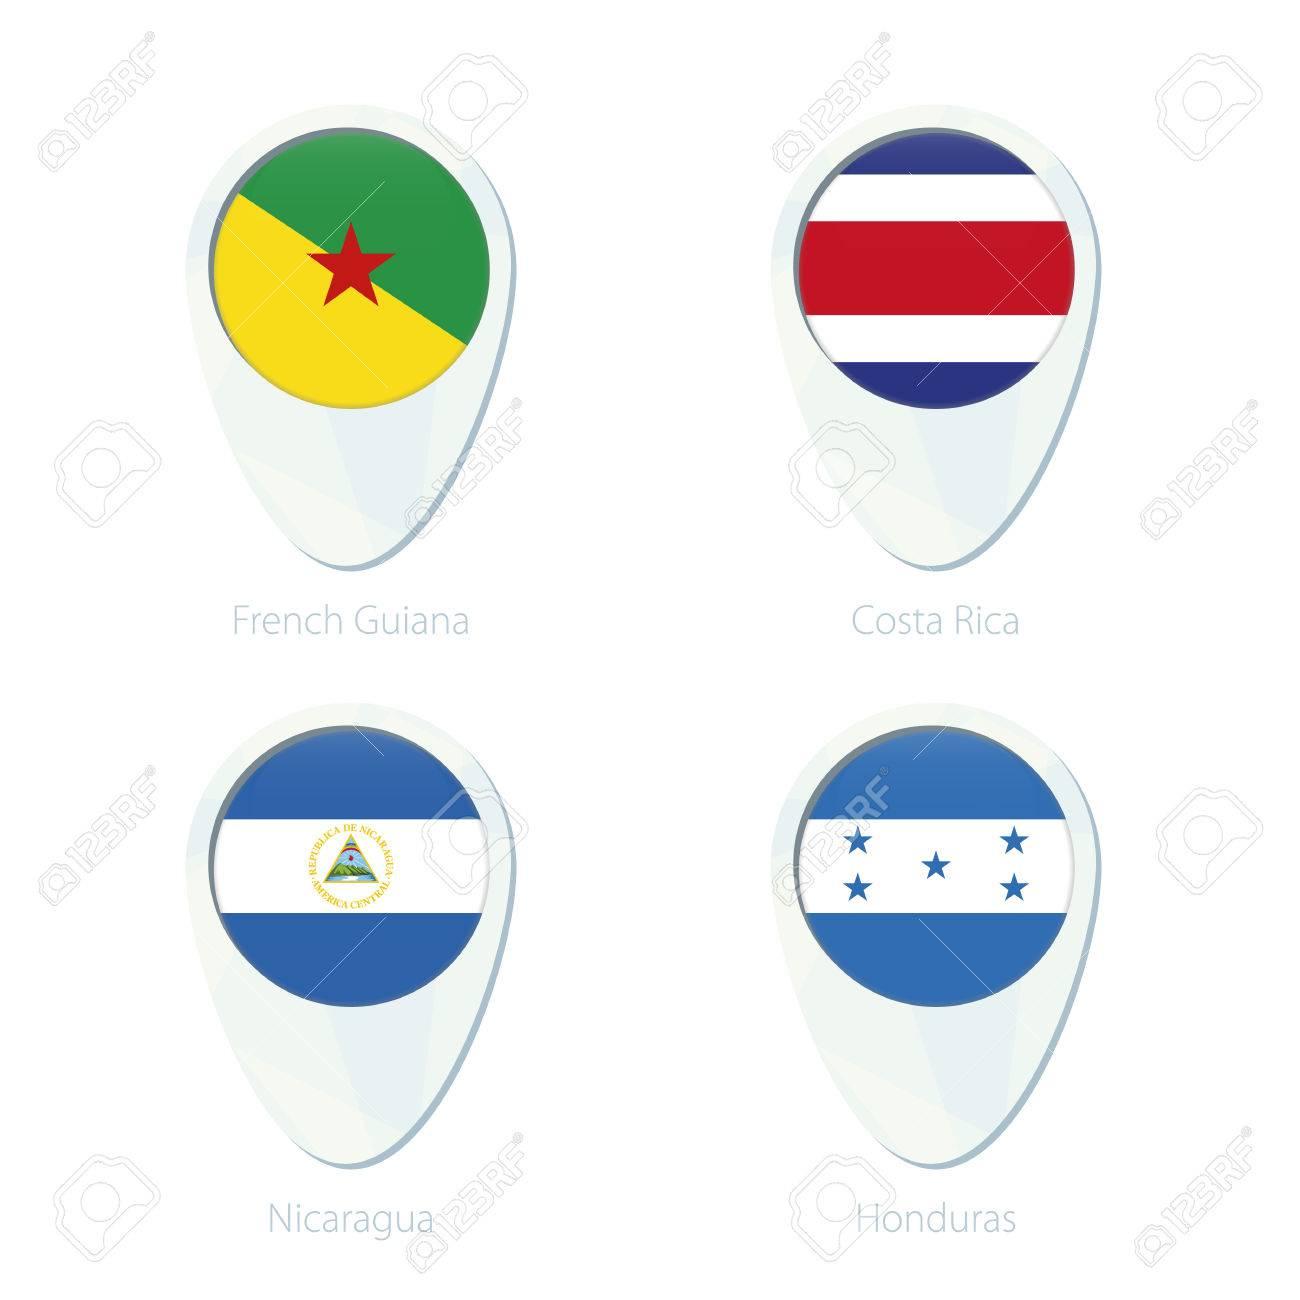 French Guiana Costa Rica Nicaragua Honduras Flag Location